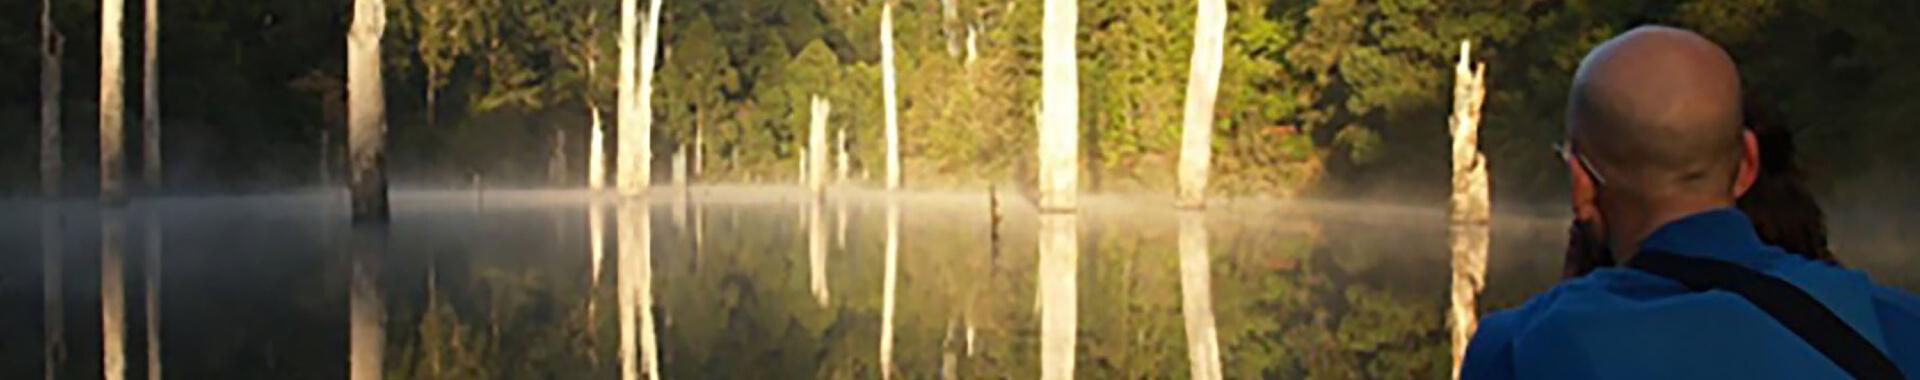 lake-elizabeth-platpyus-great-ocean-road-around-about-unique